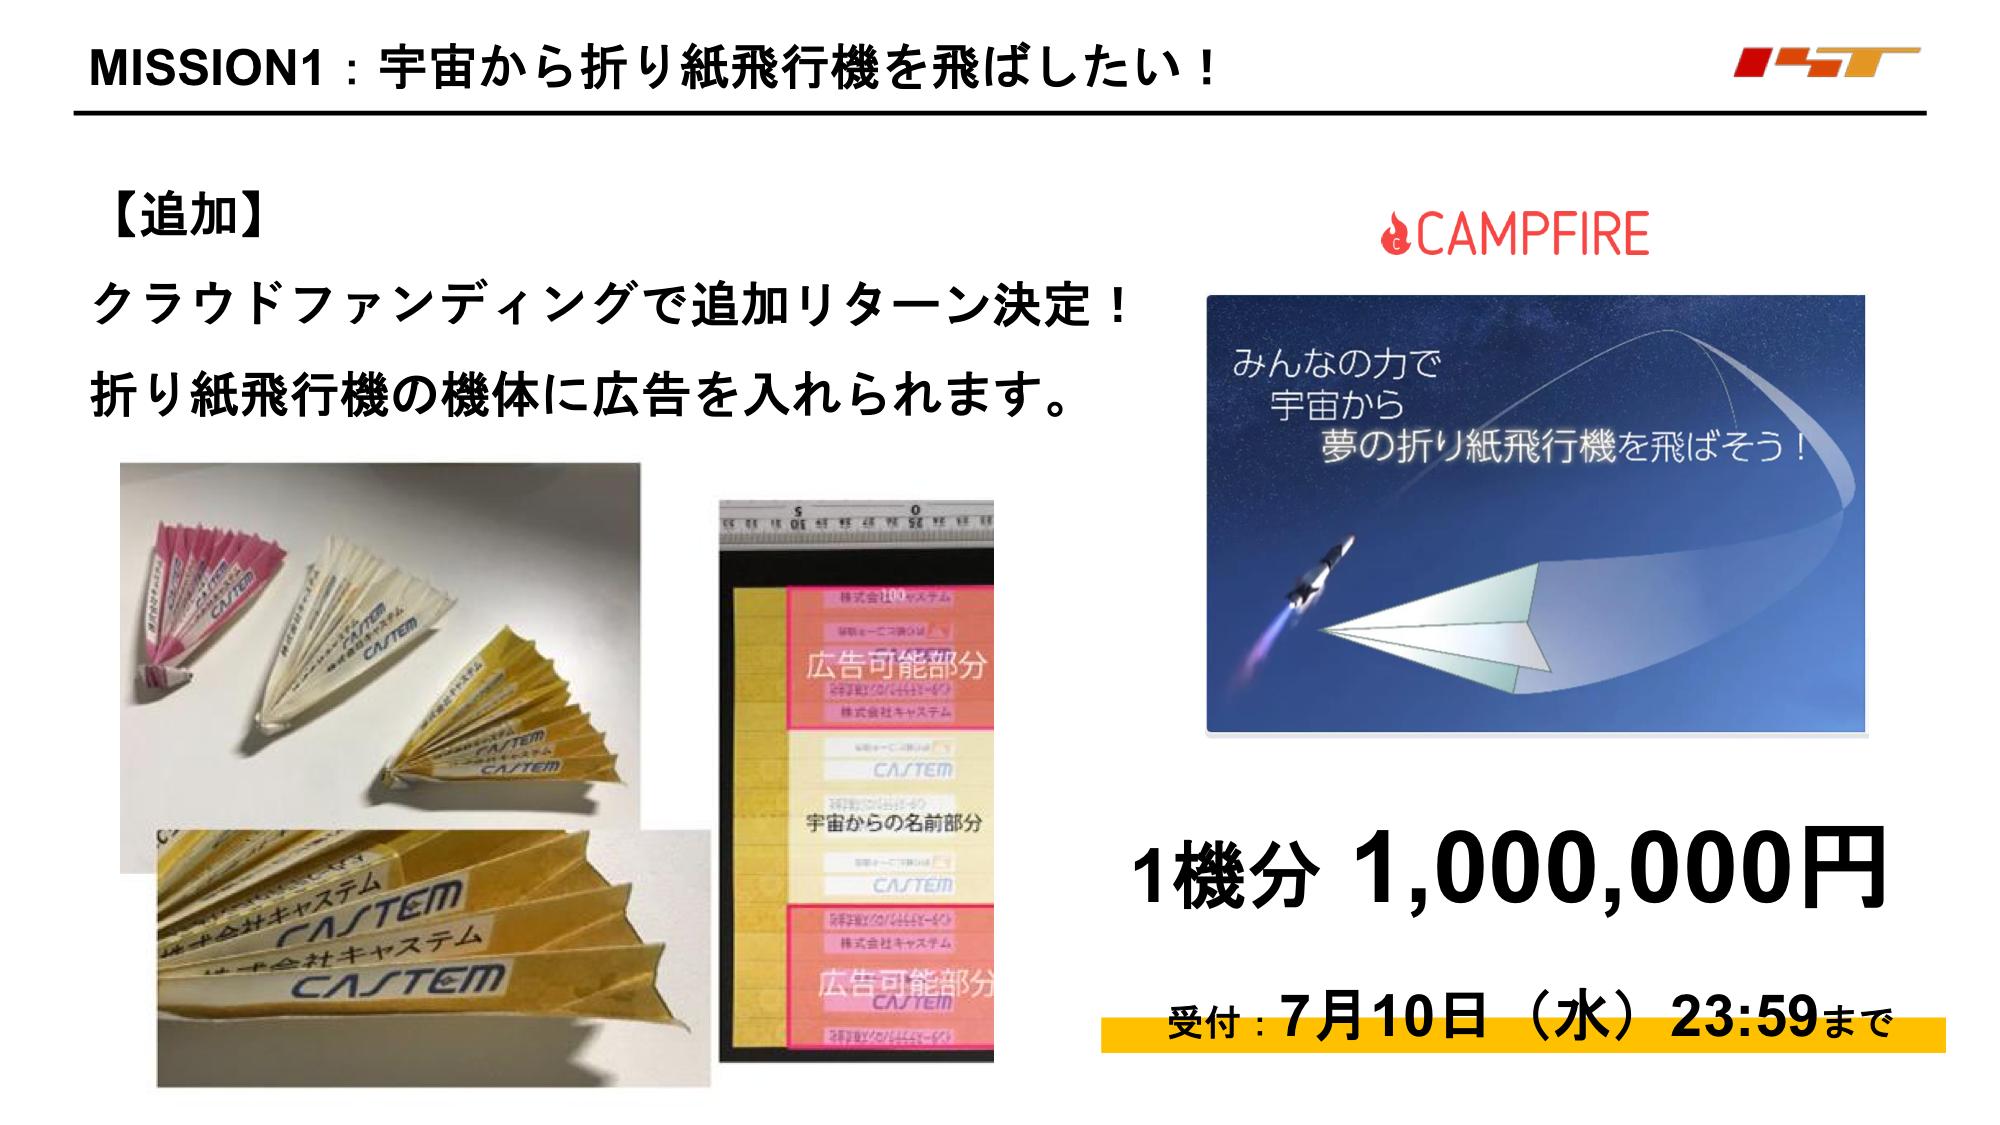 f:id:Imamura:20190628161222p:plain